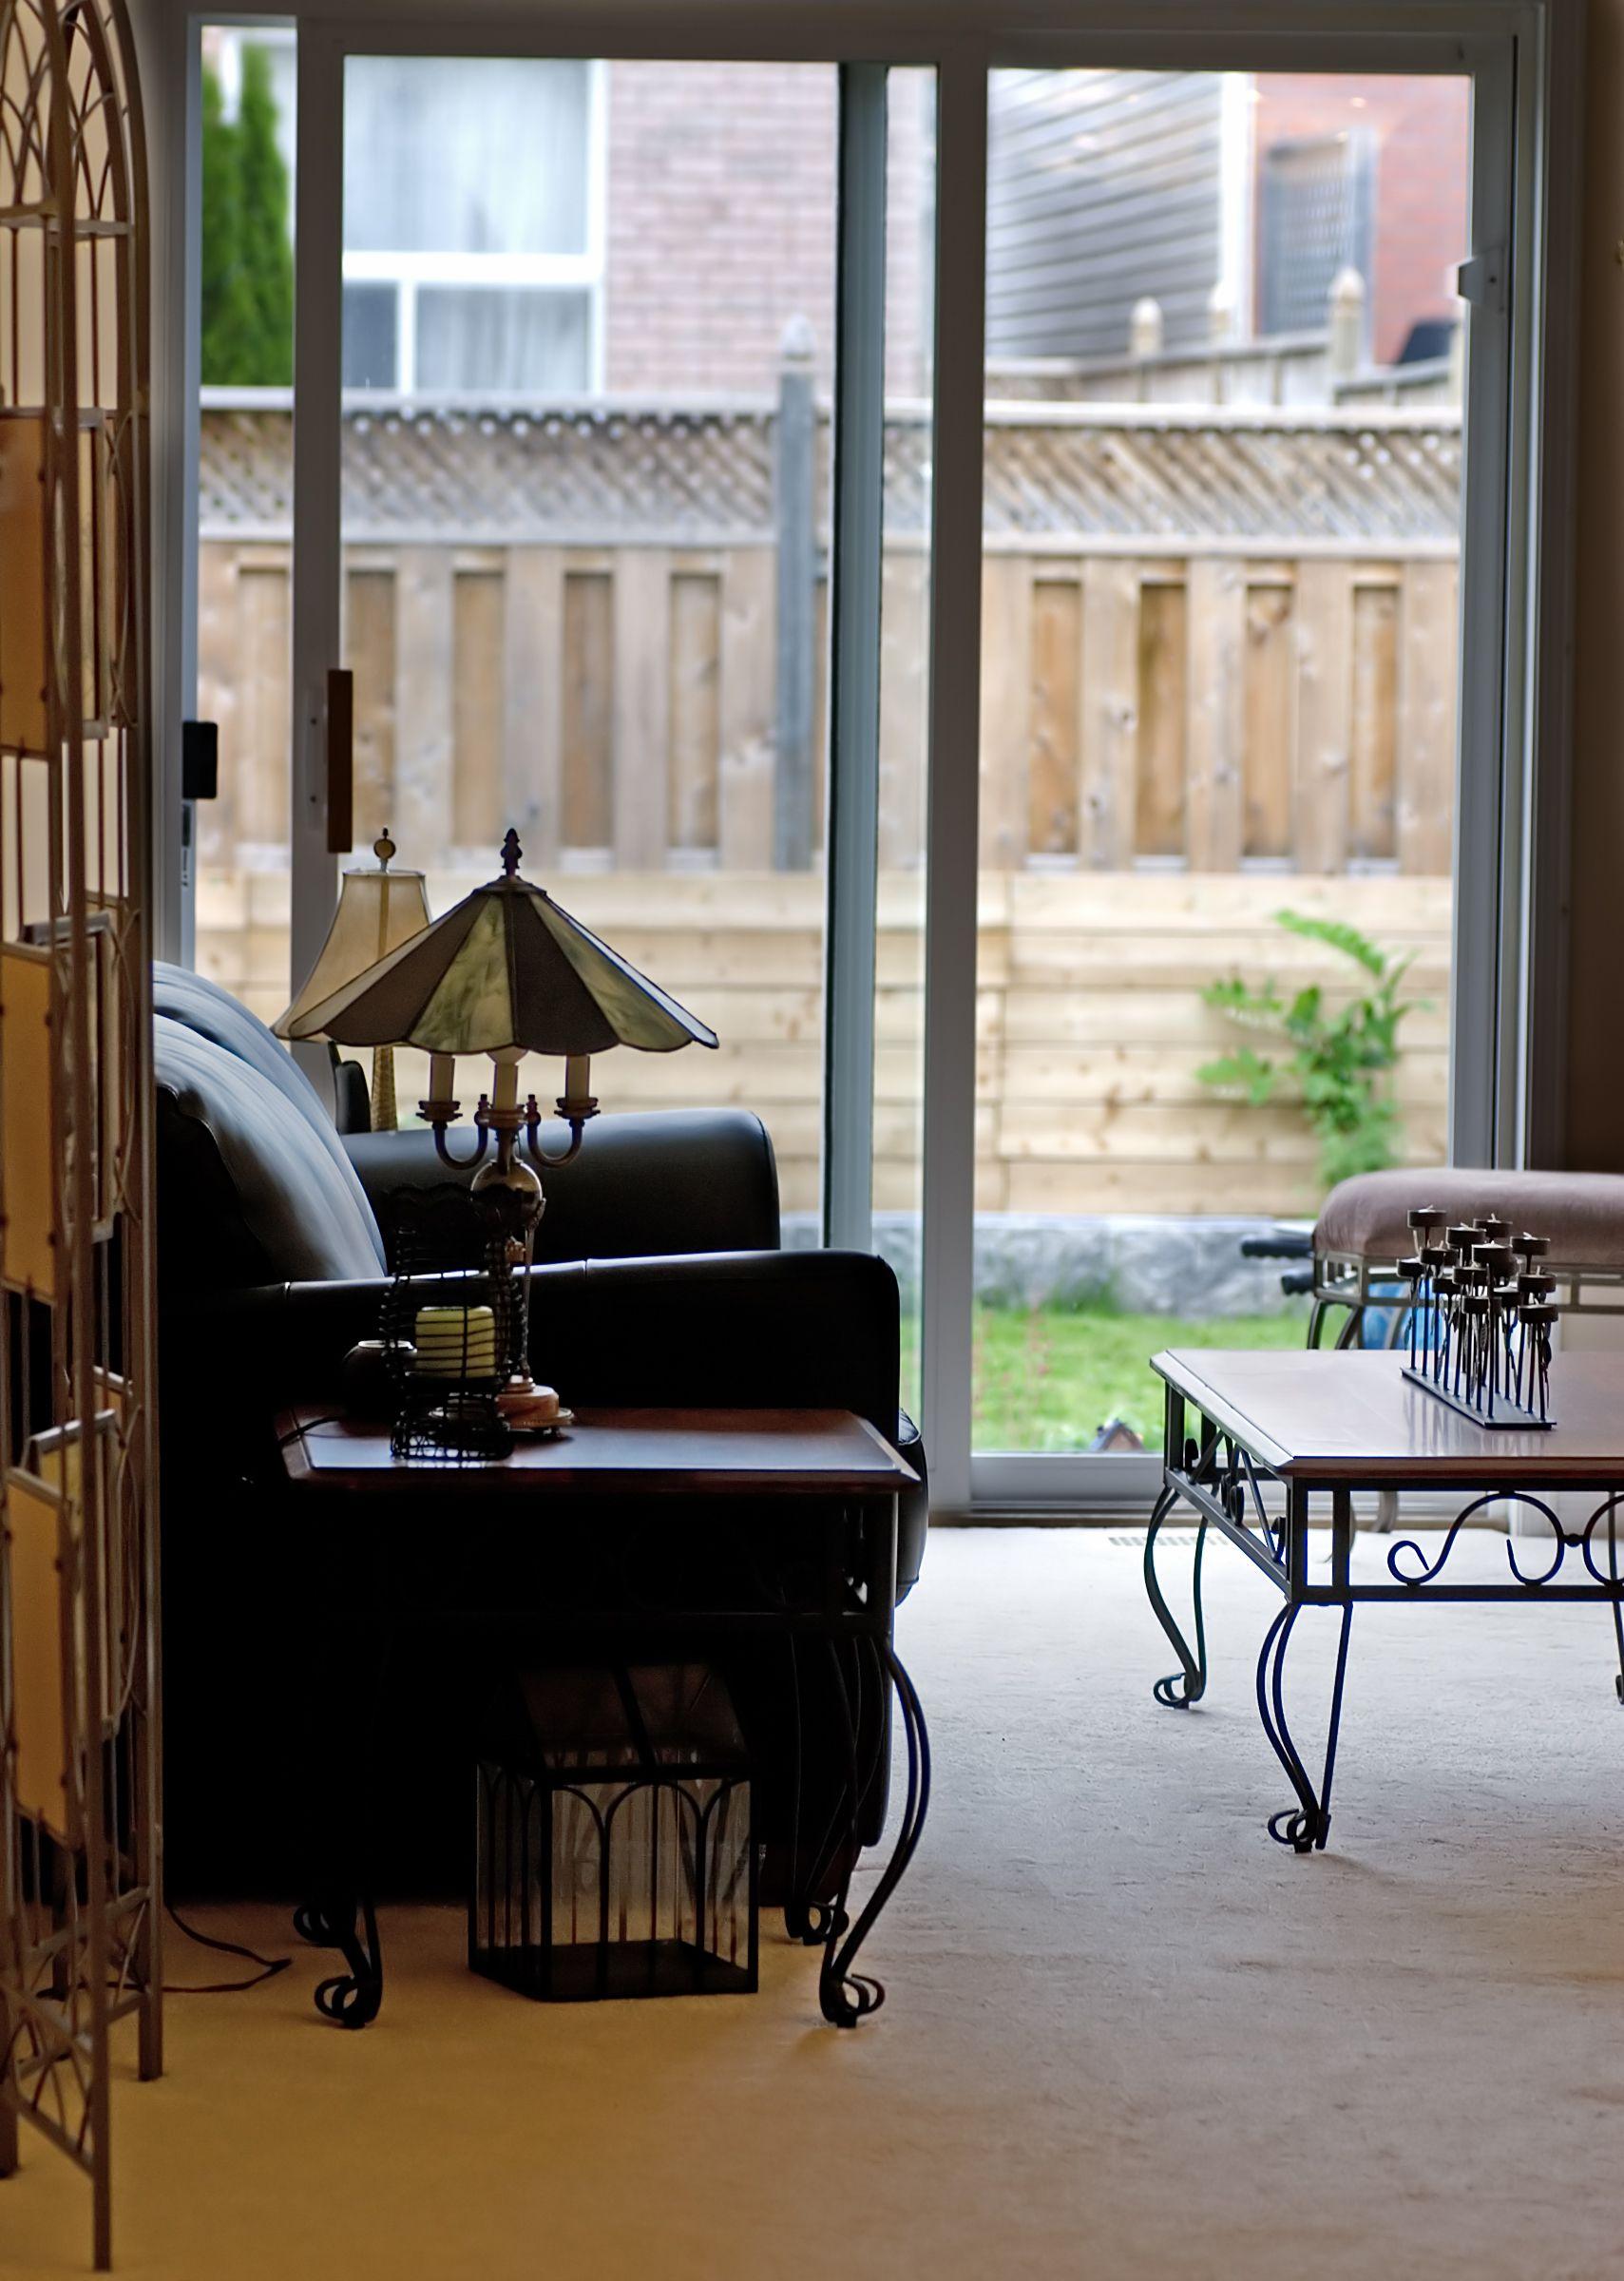 Ideas de decoraci n para caba as peque as puertas de for Maneras de decorar tu casa